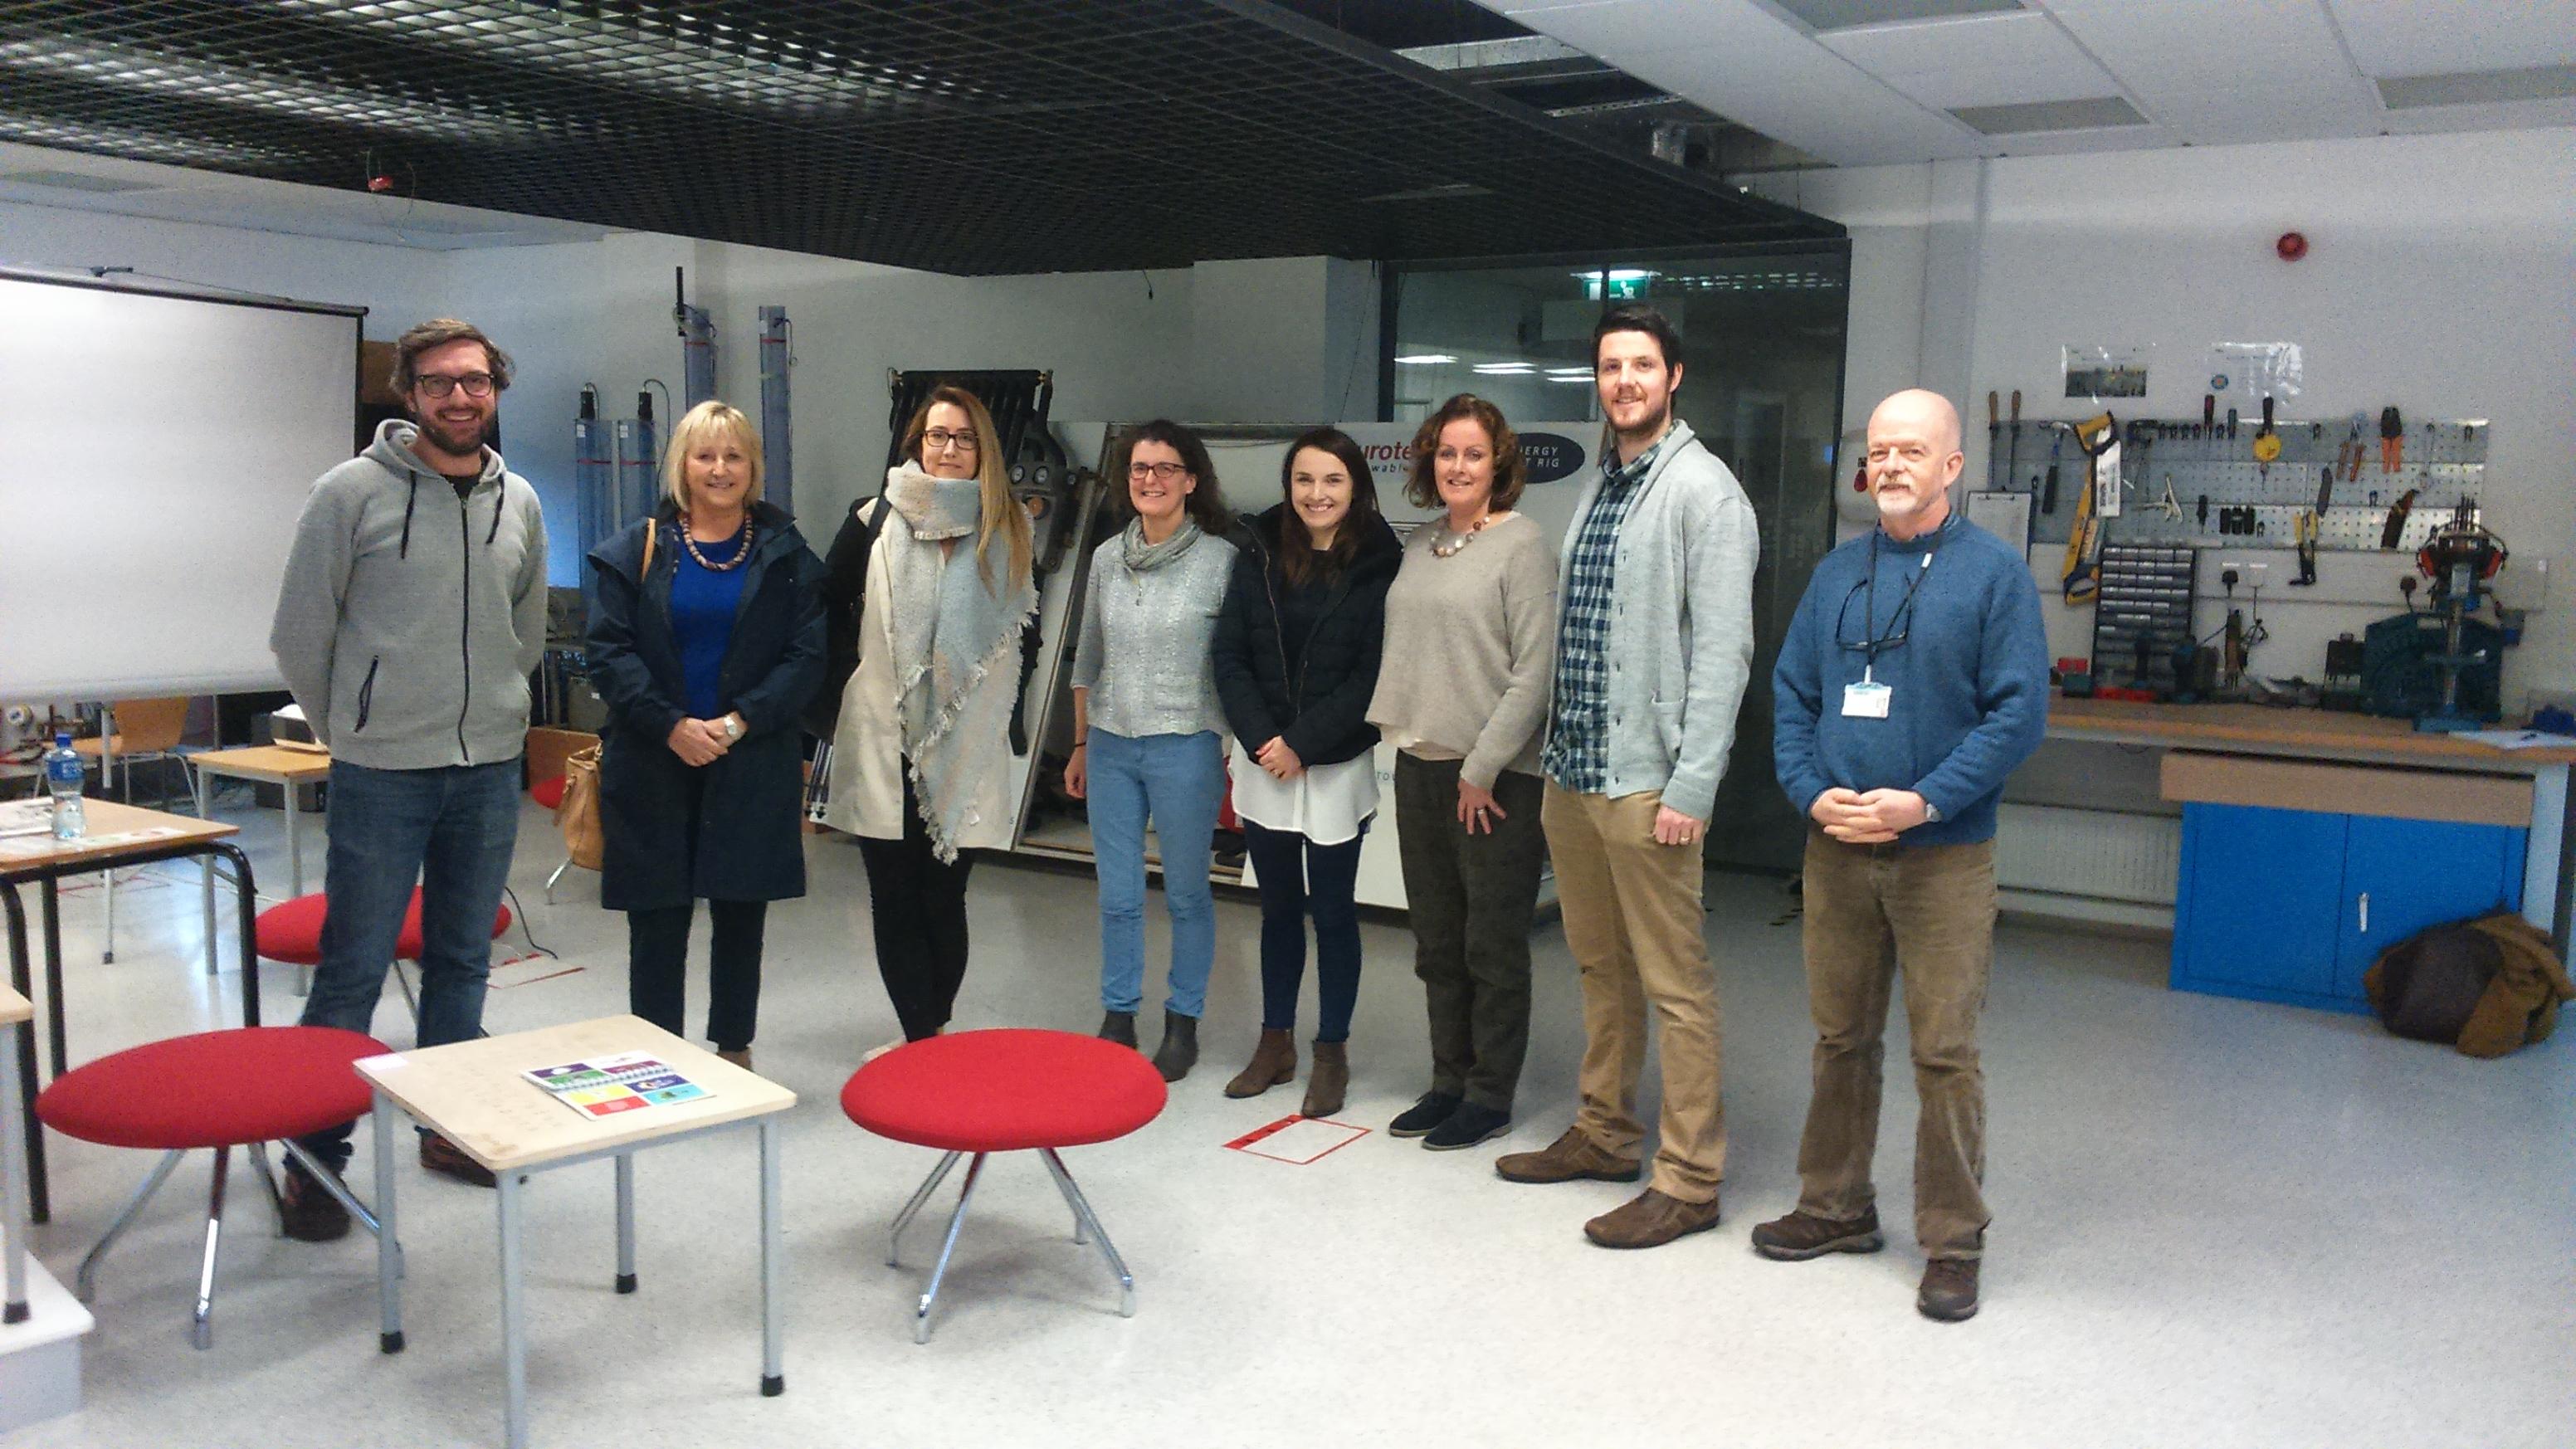 HSE occupational therapists visit Nimbus Centre